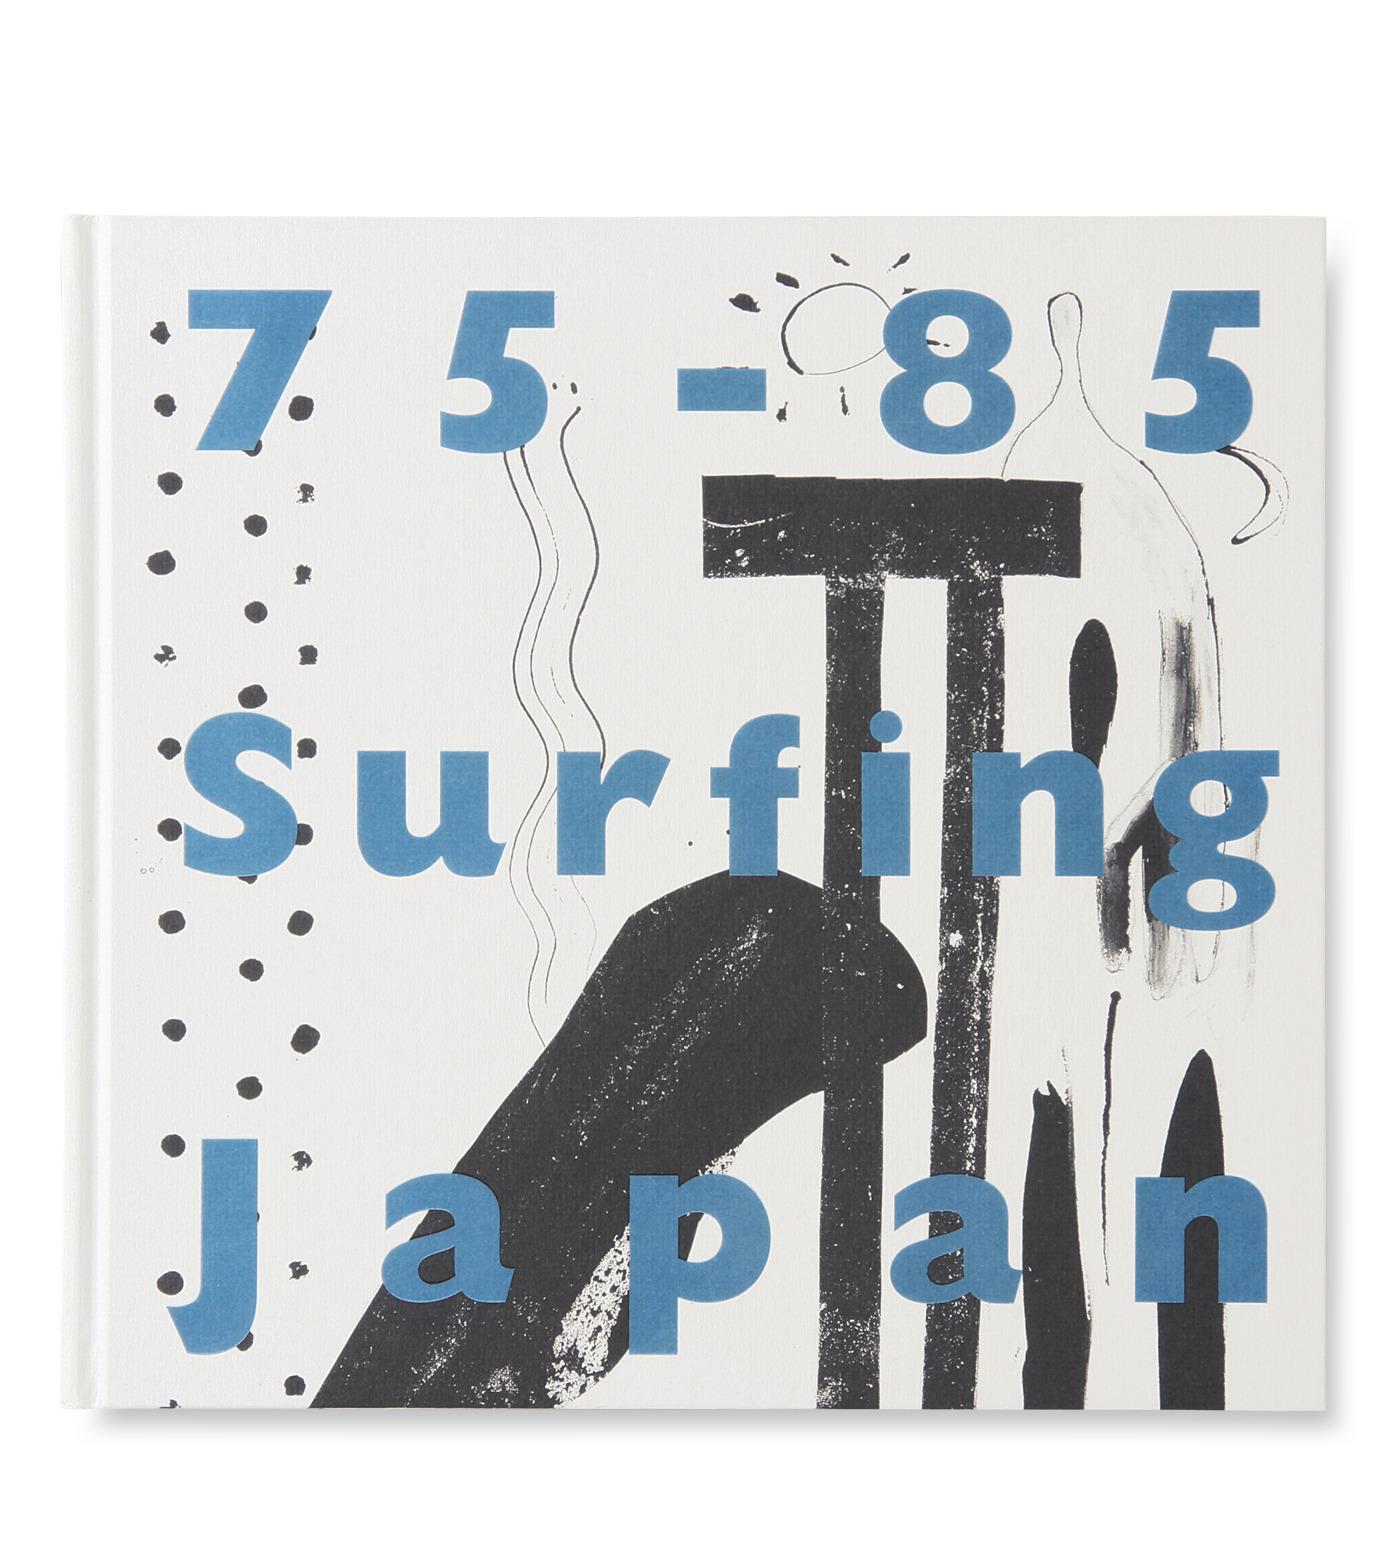 Bueno!Books(ブエノ! ブックス)の75-85 surfing ja-NONE-75-85-Surfin-0 拡大詳細画像1